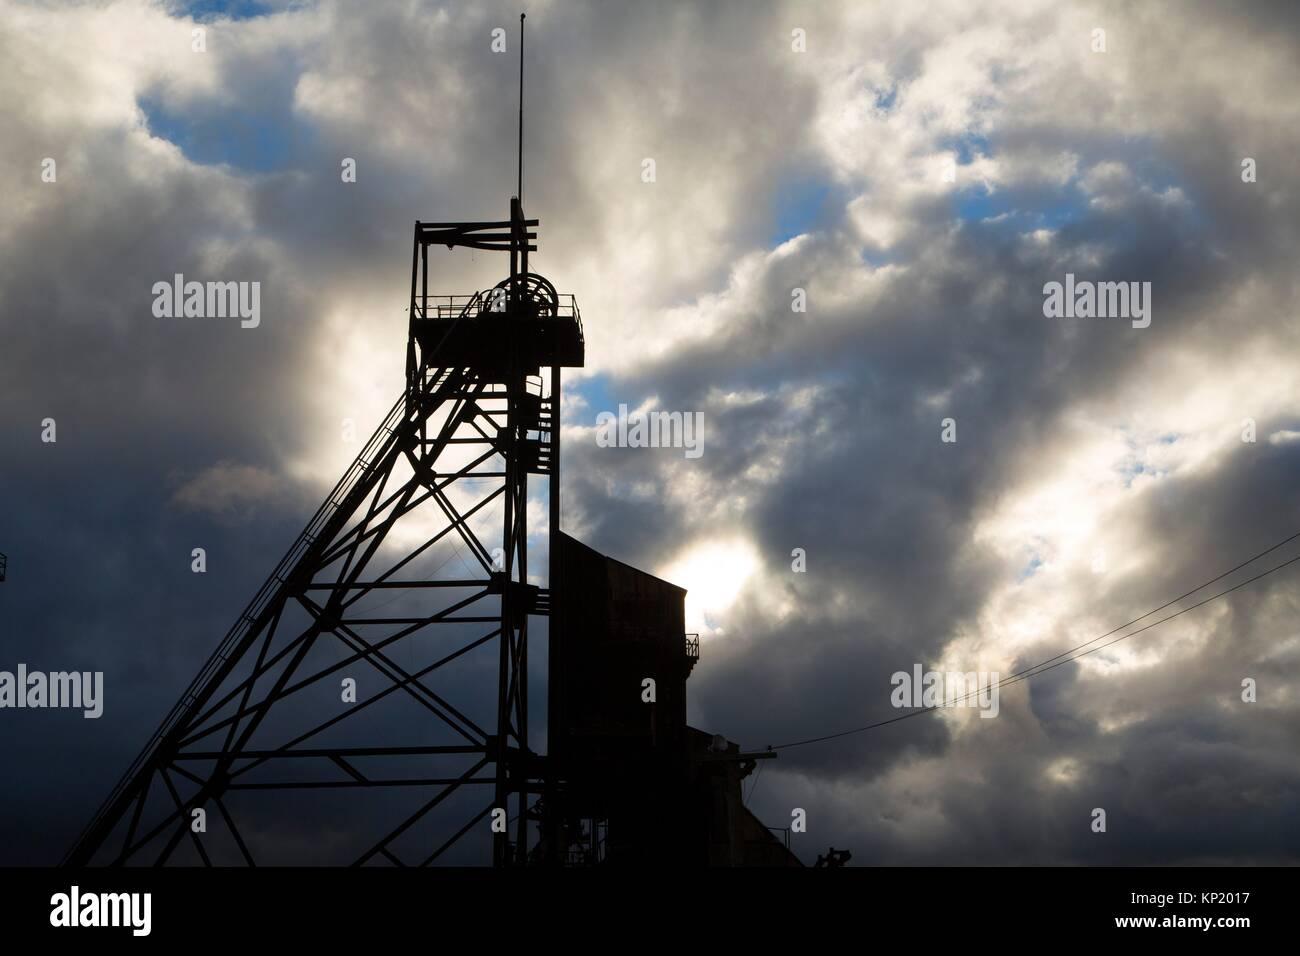 Anselmo Mine Headframe (Gallows), Butte, Montana. - Stock Image